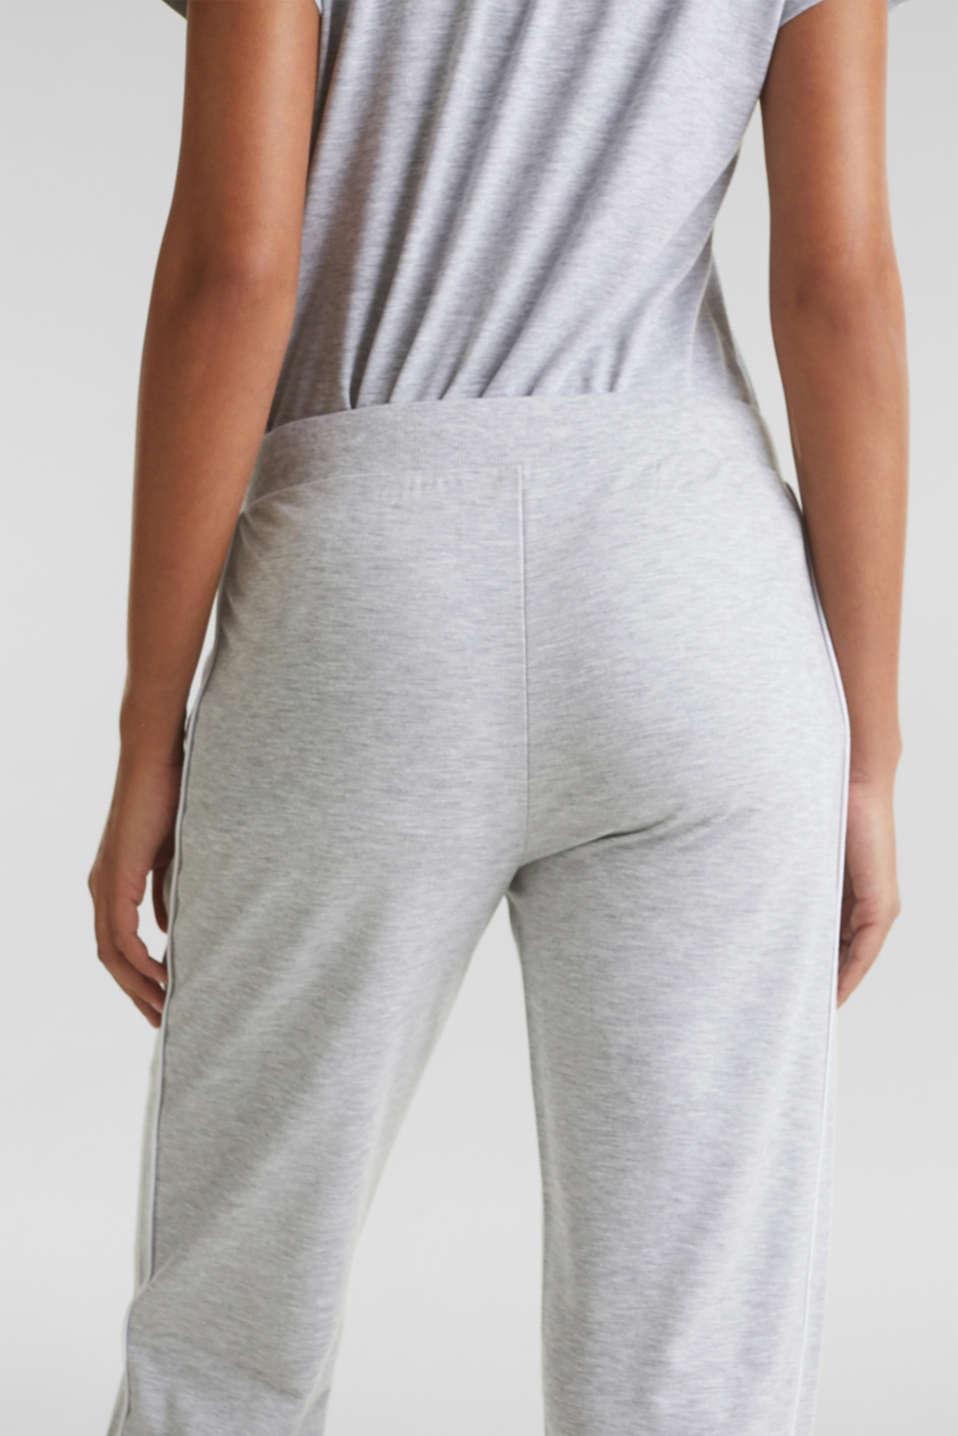 Melange stretch jersey trousers, MEDIUM GREY, detail image number 5